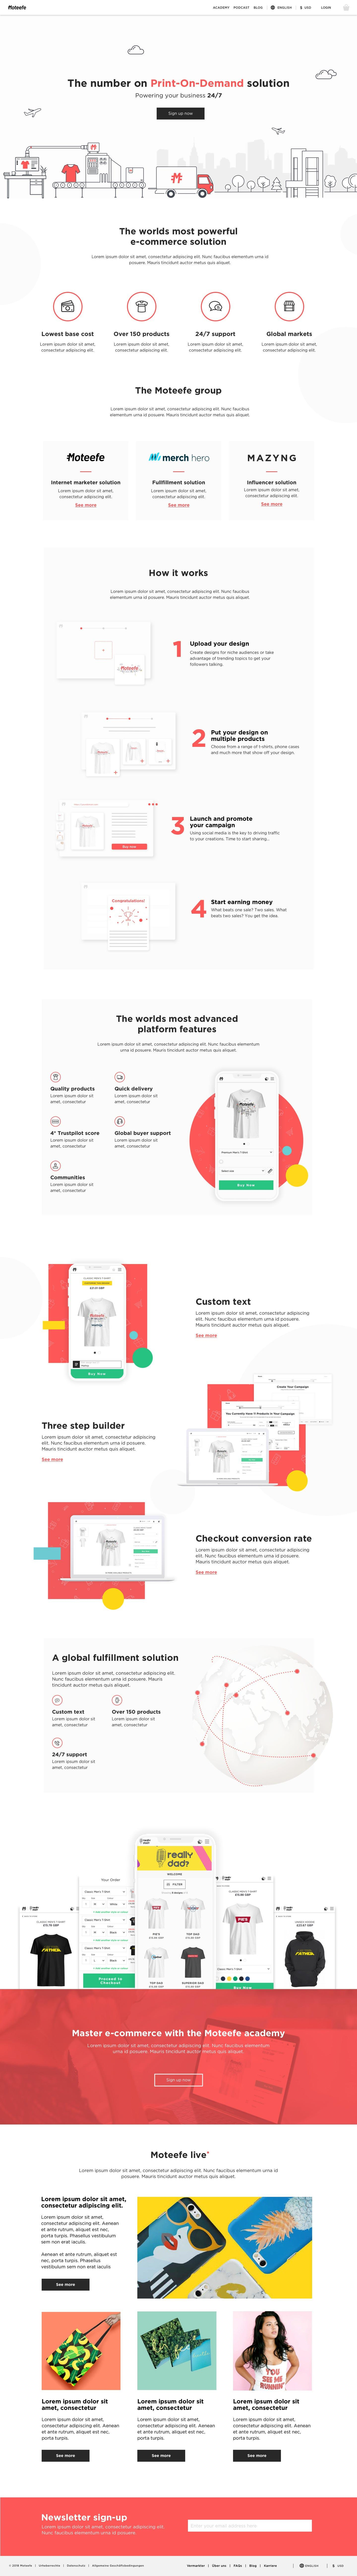 Moteefe website UI full homepage design.